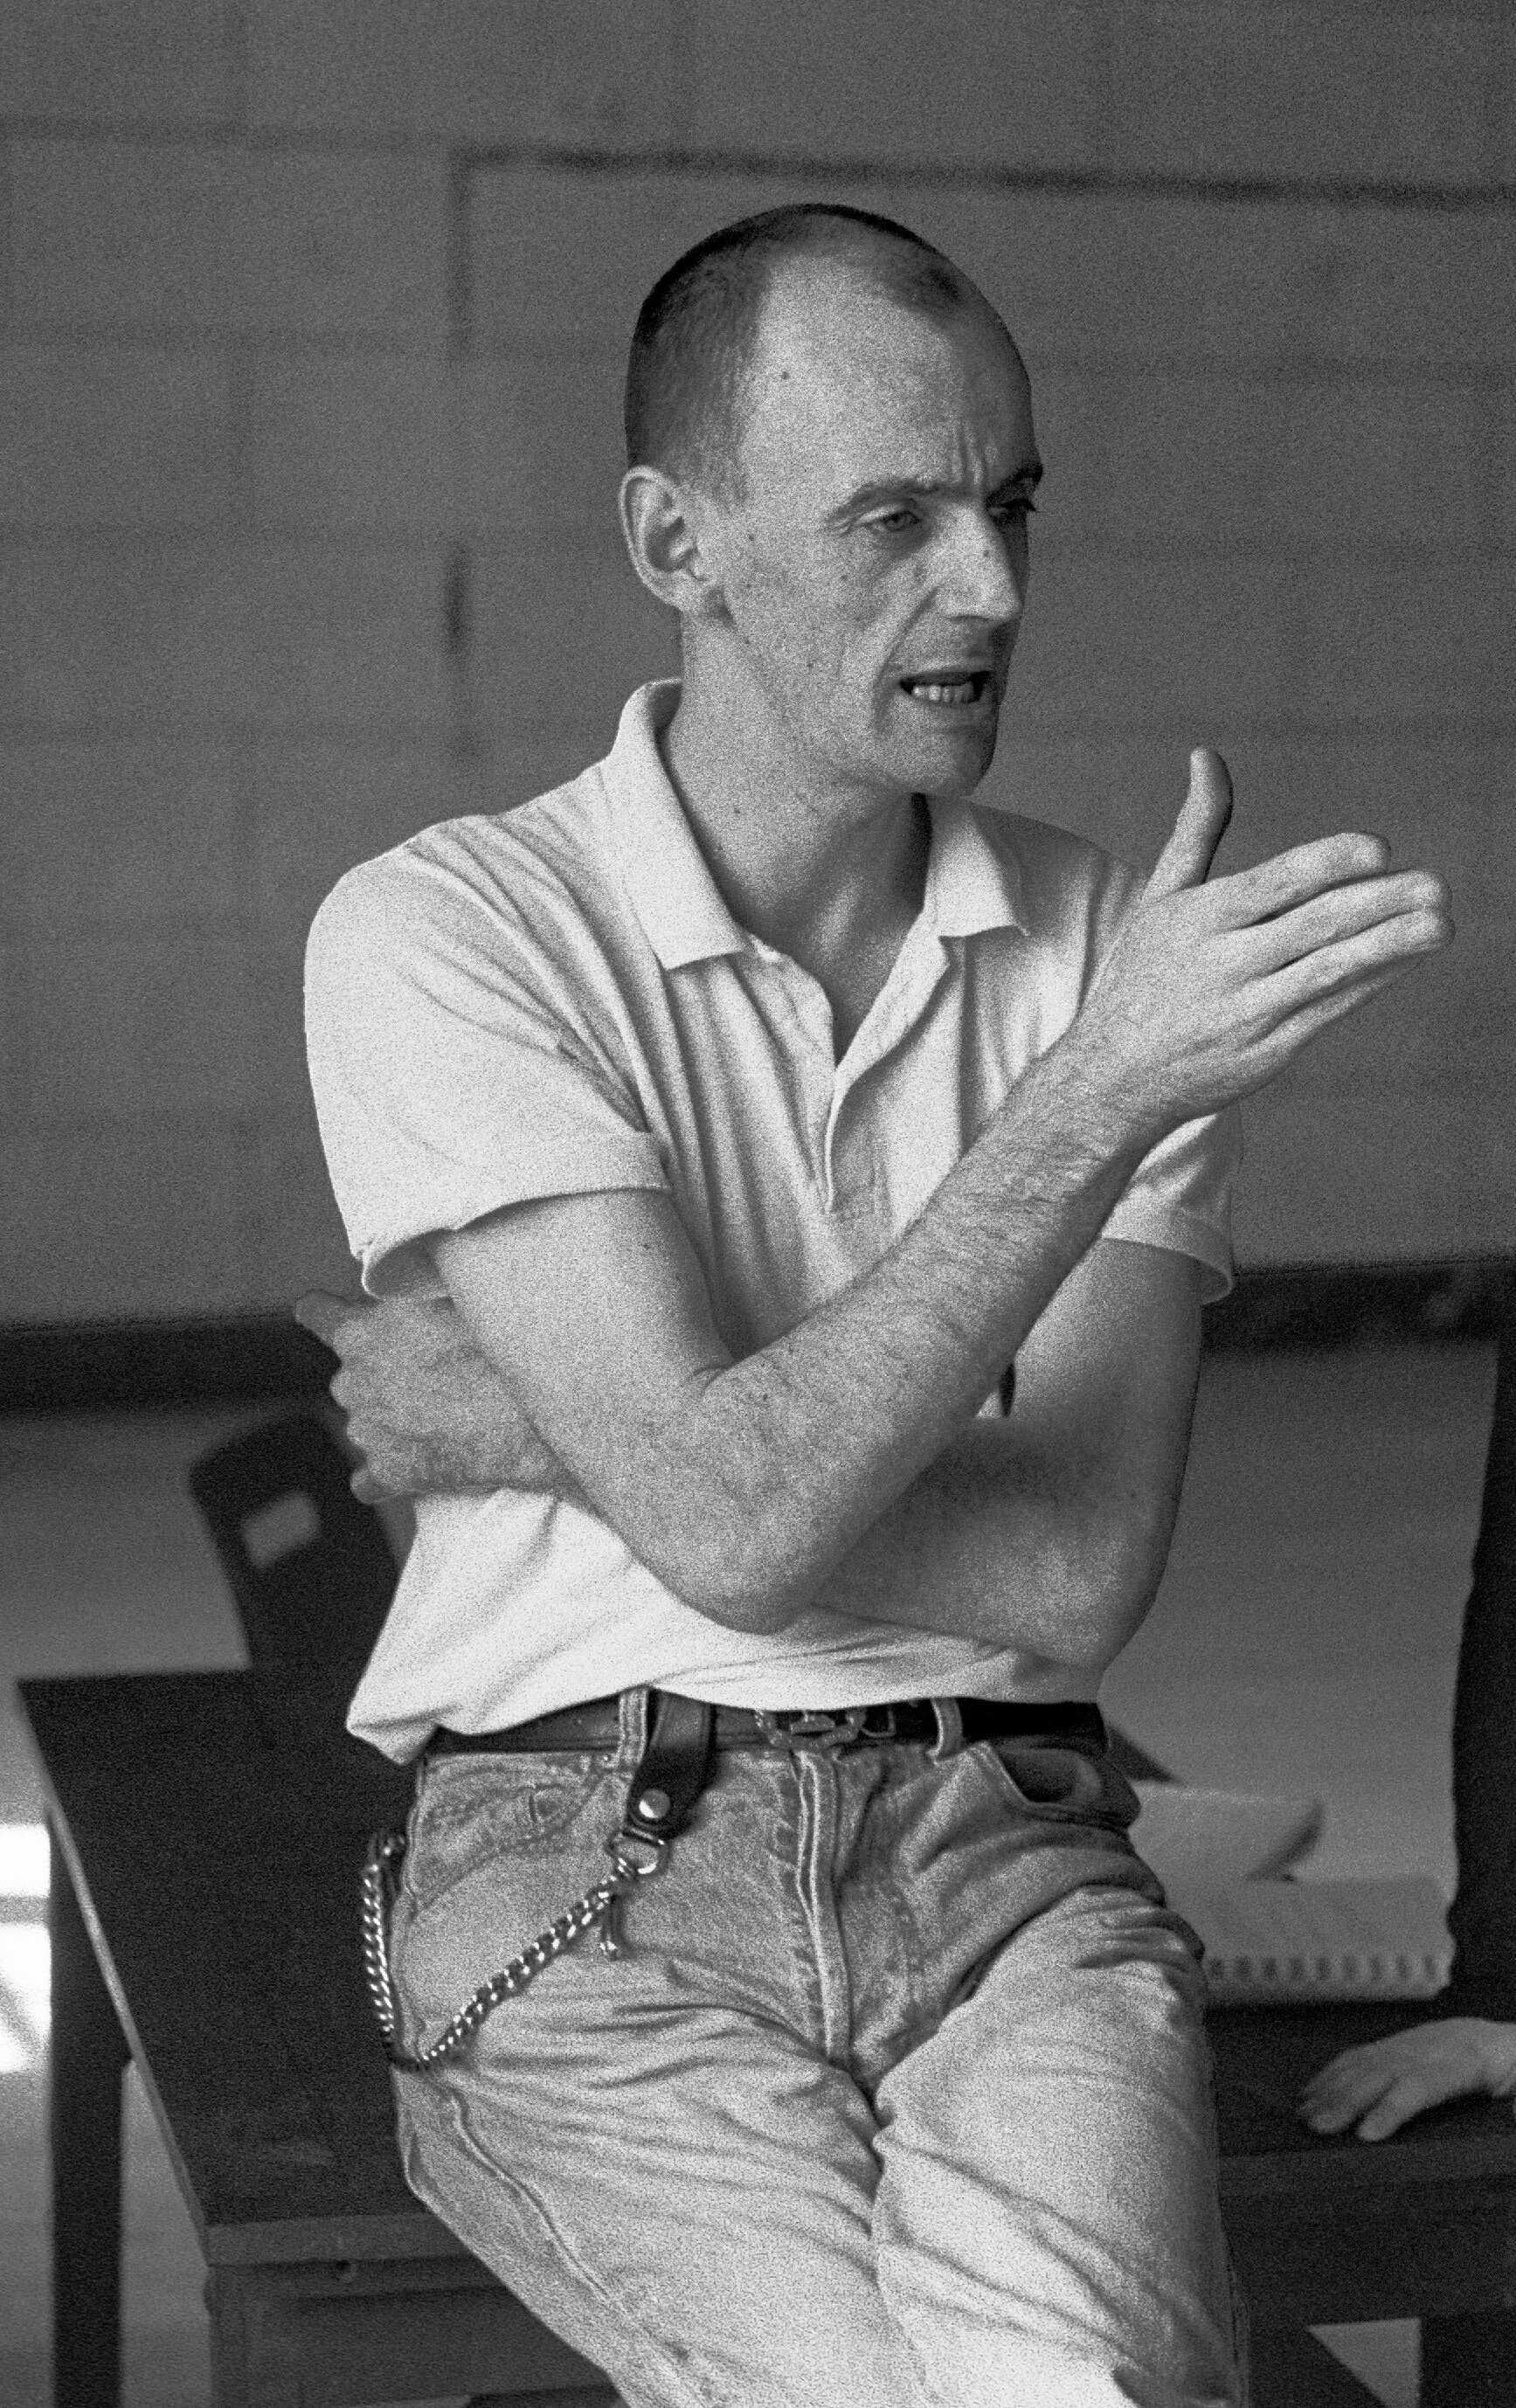 image for Lagarce, Jean-Luc (1957-1995)